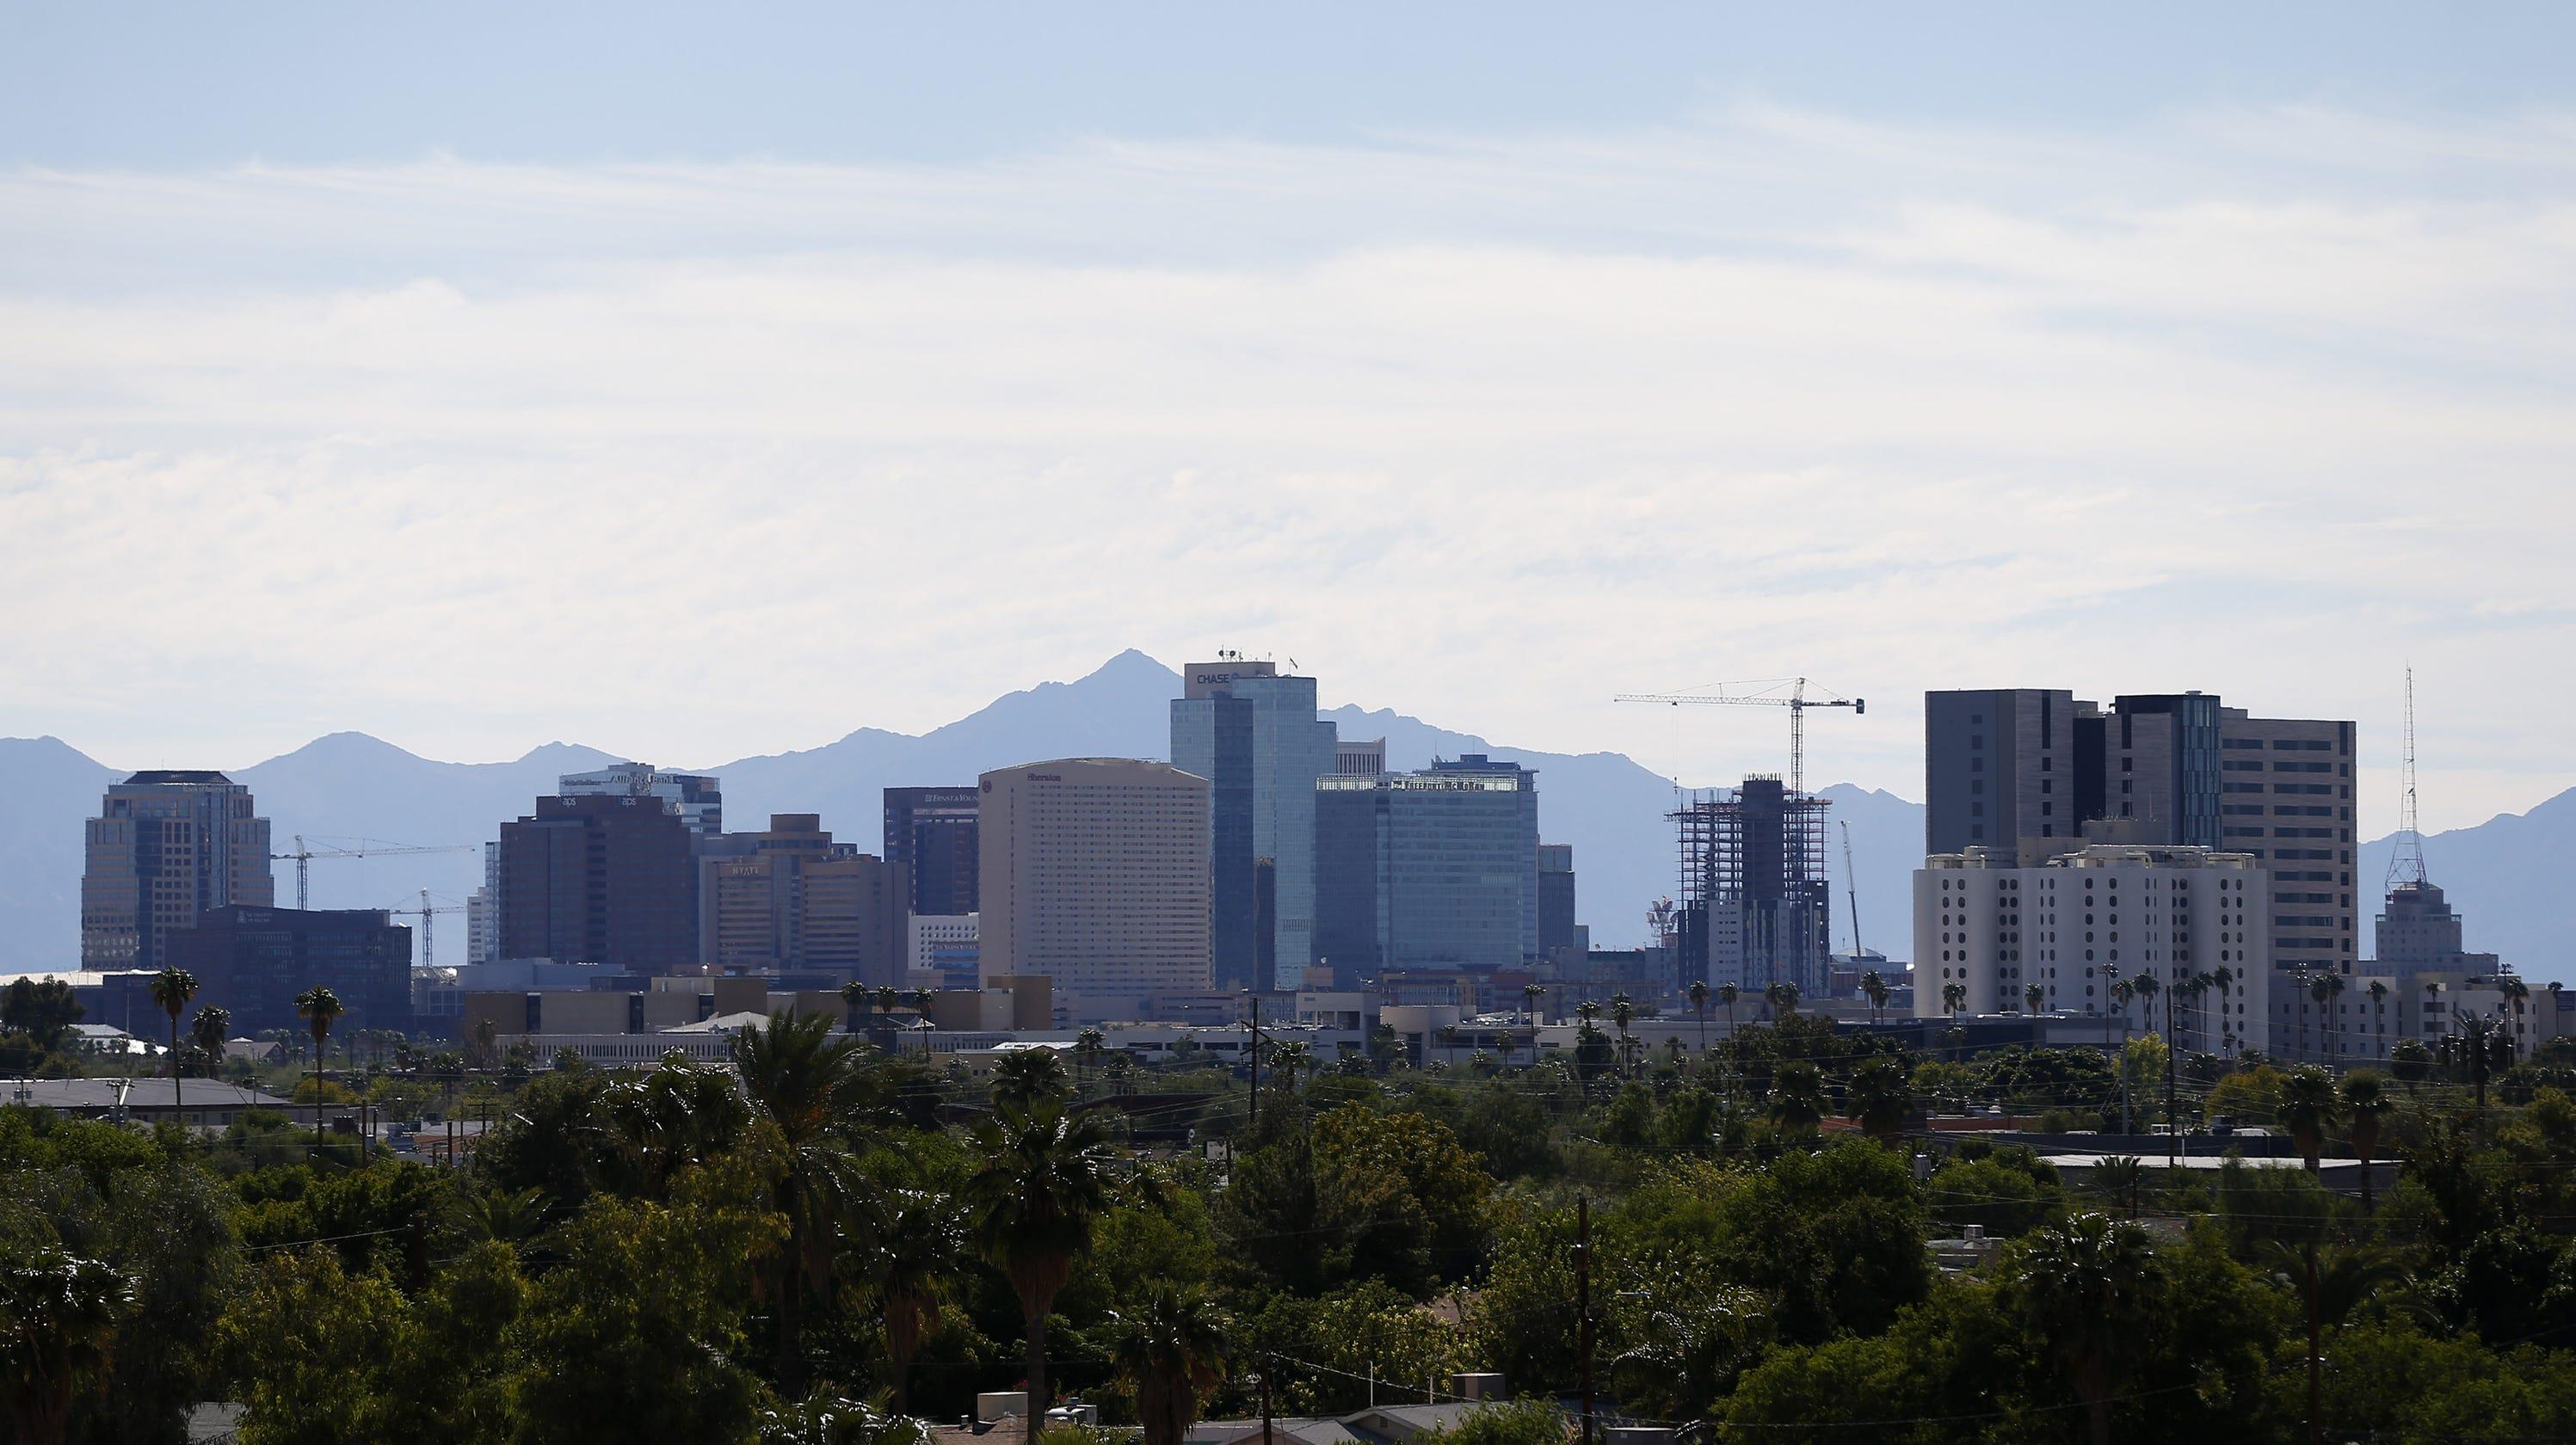 Downtown Phoenix: 'Extraordinary' rebirth brings hope ... on future asia map, future pangea map, future texas map, future florida map, future new york map, future nyc map, future california map, future united states map, future hawaii map,